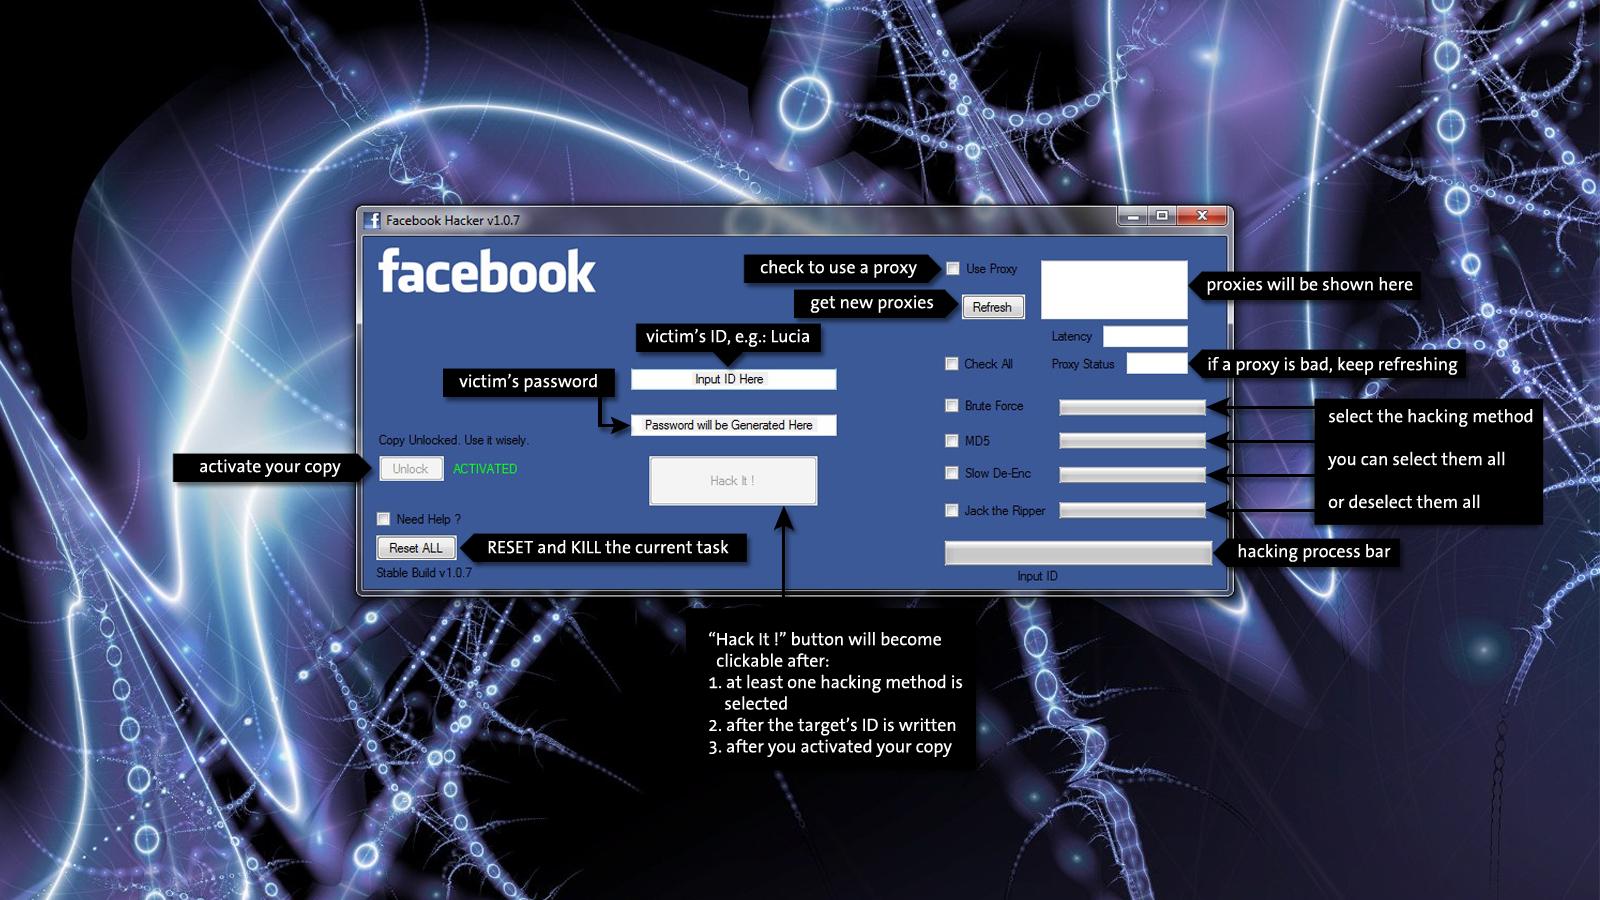 Kumpulan Aplikasi Hack Password Facebookl [EXCLUSIVE] Instructions+-+How+to+use+Facebook+Hacker